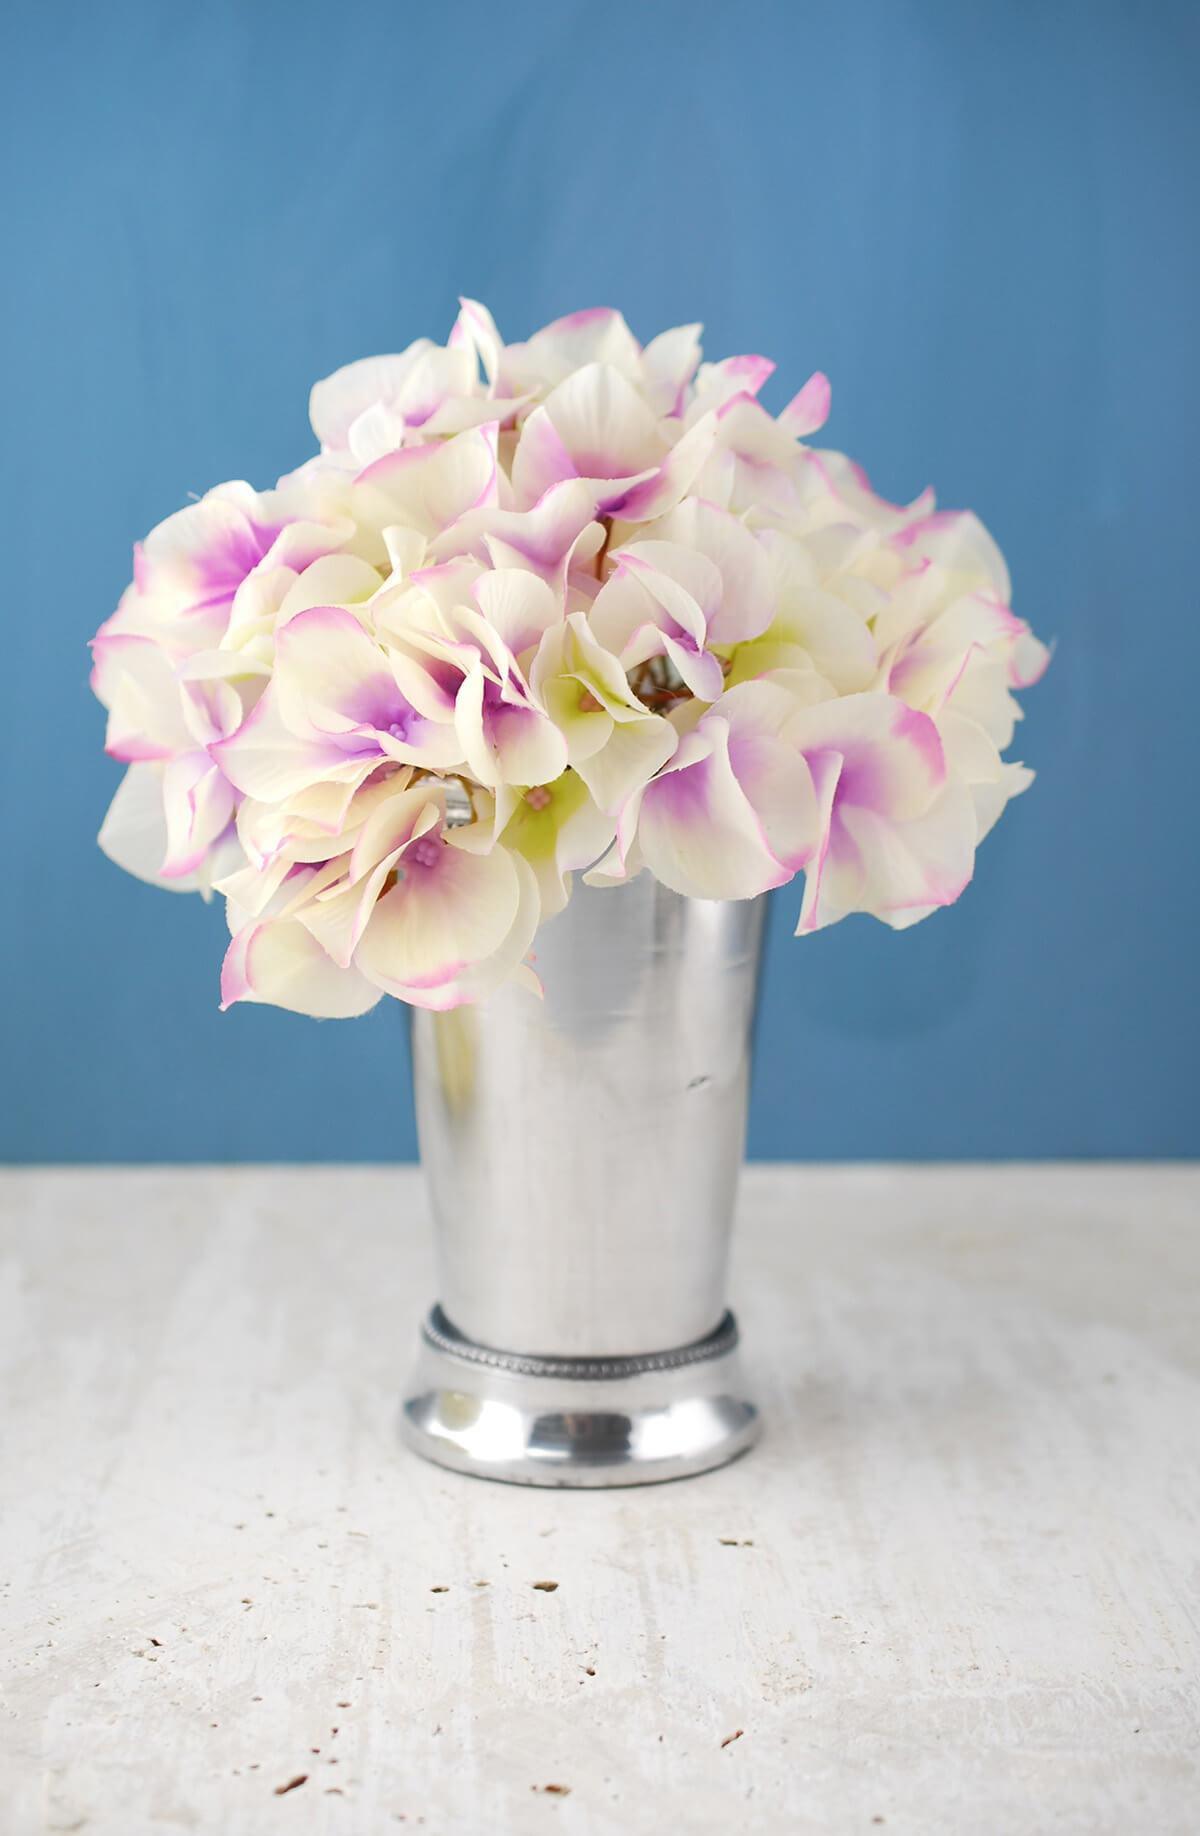 Mint Julep Cups 5.75in, Zealand Vase